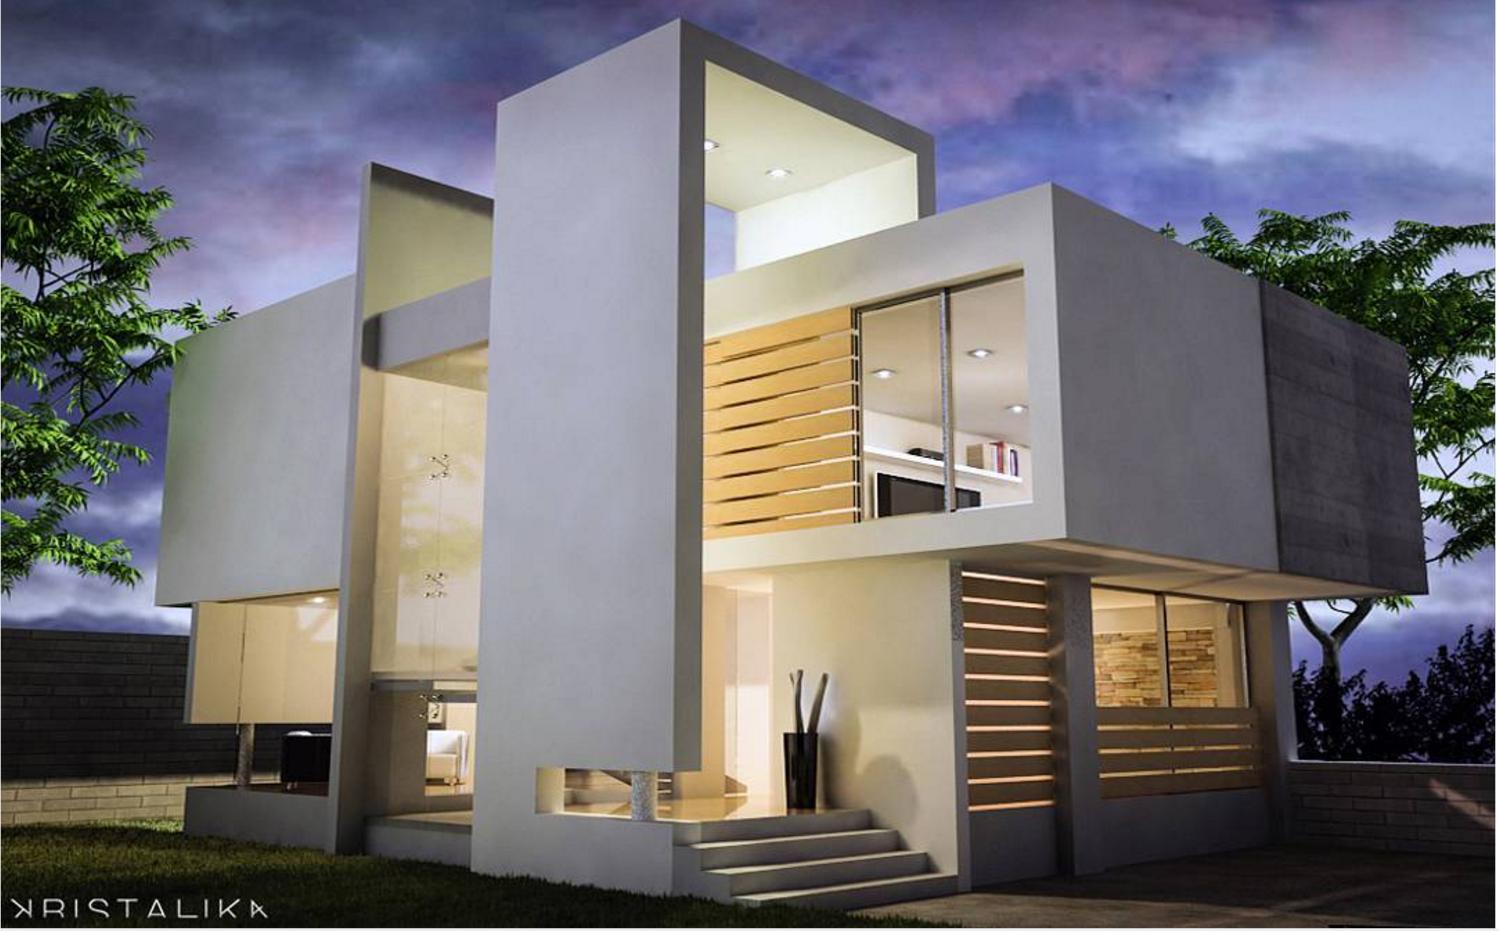 101 planos de casas vivienda con un dise o conceptual for Viviendas minimalistas